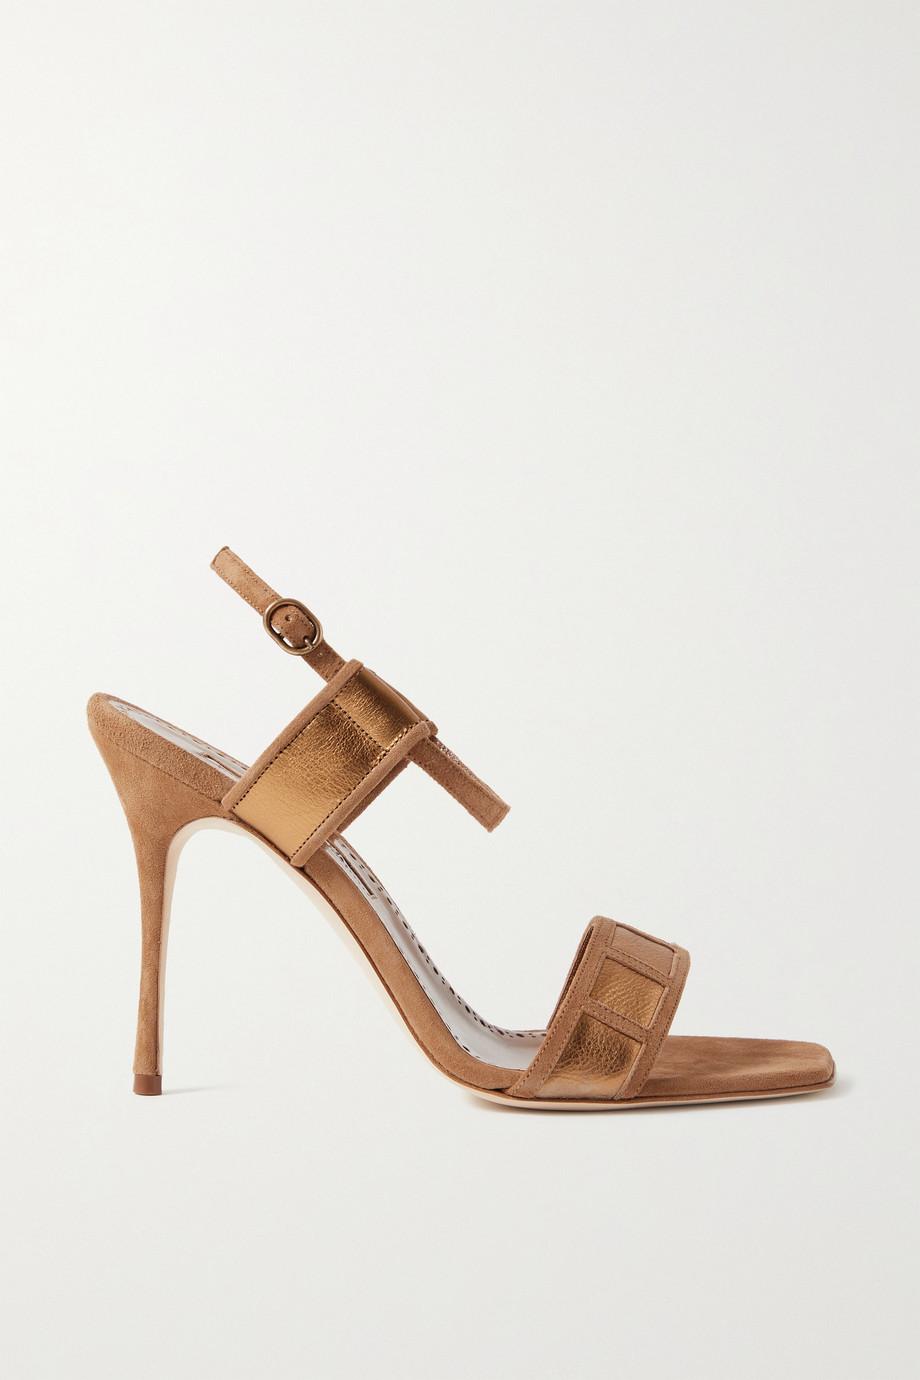 Manolo Blahnik Pitona metallic leather-trimmed suede sandals